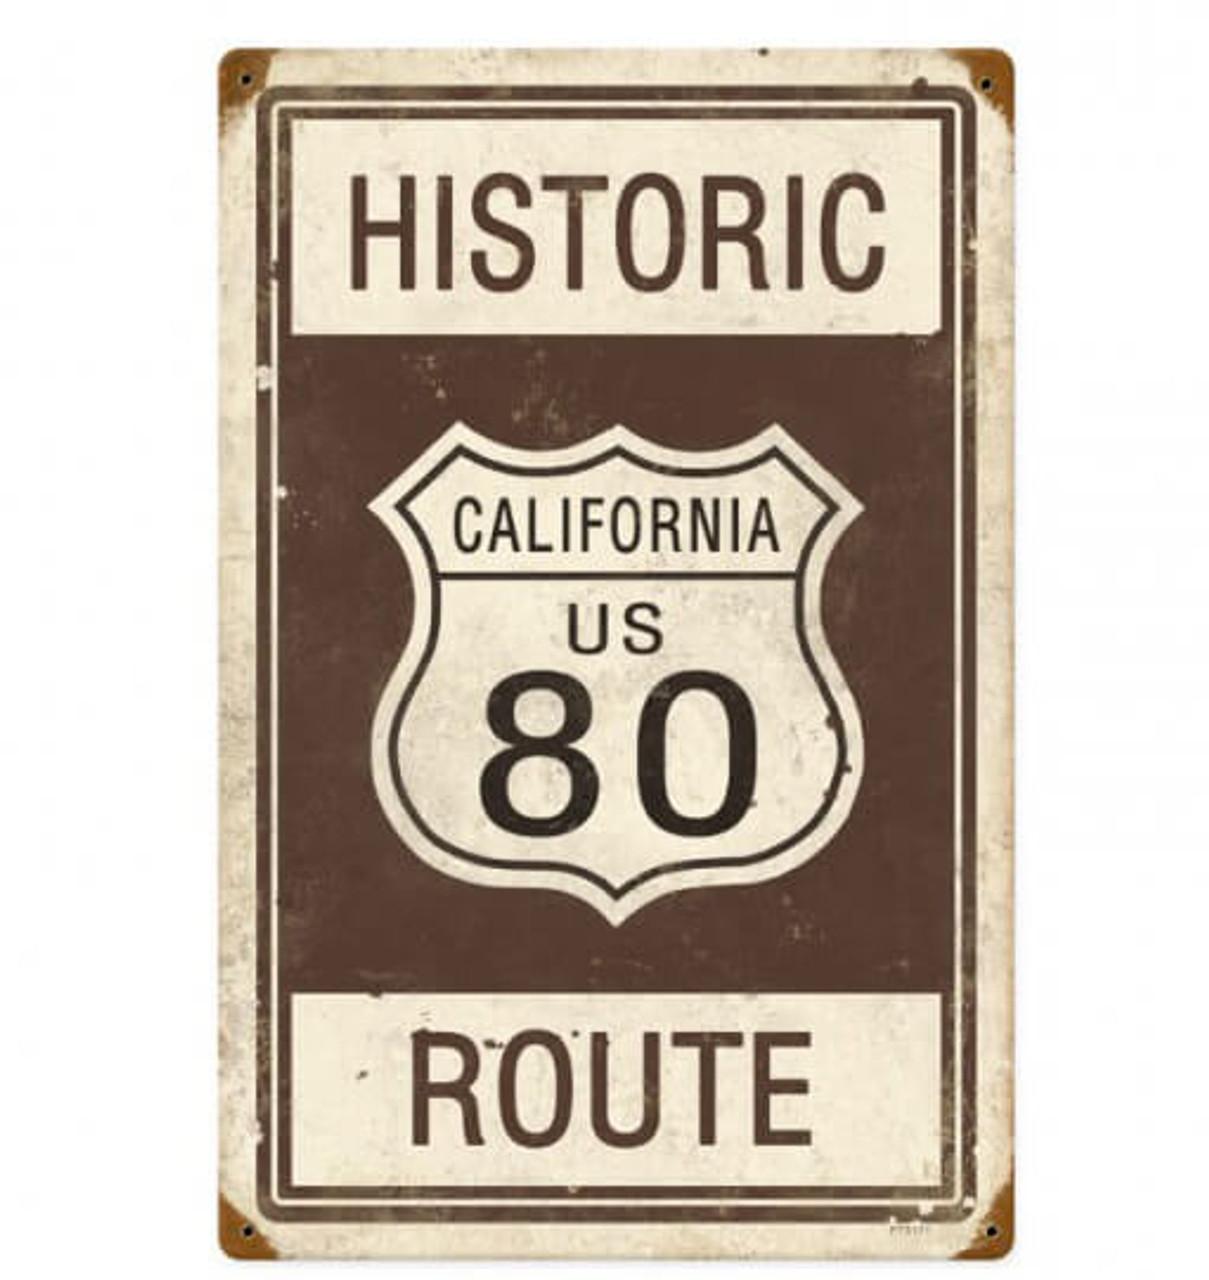 Retro Historic Route 80 Metal Sign 12 x 18 Inches